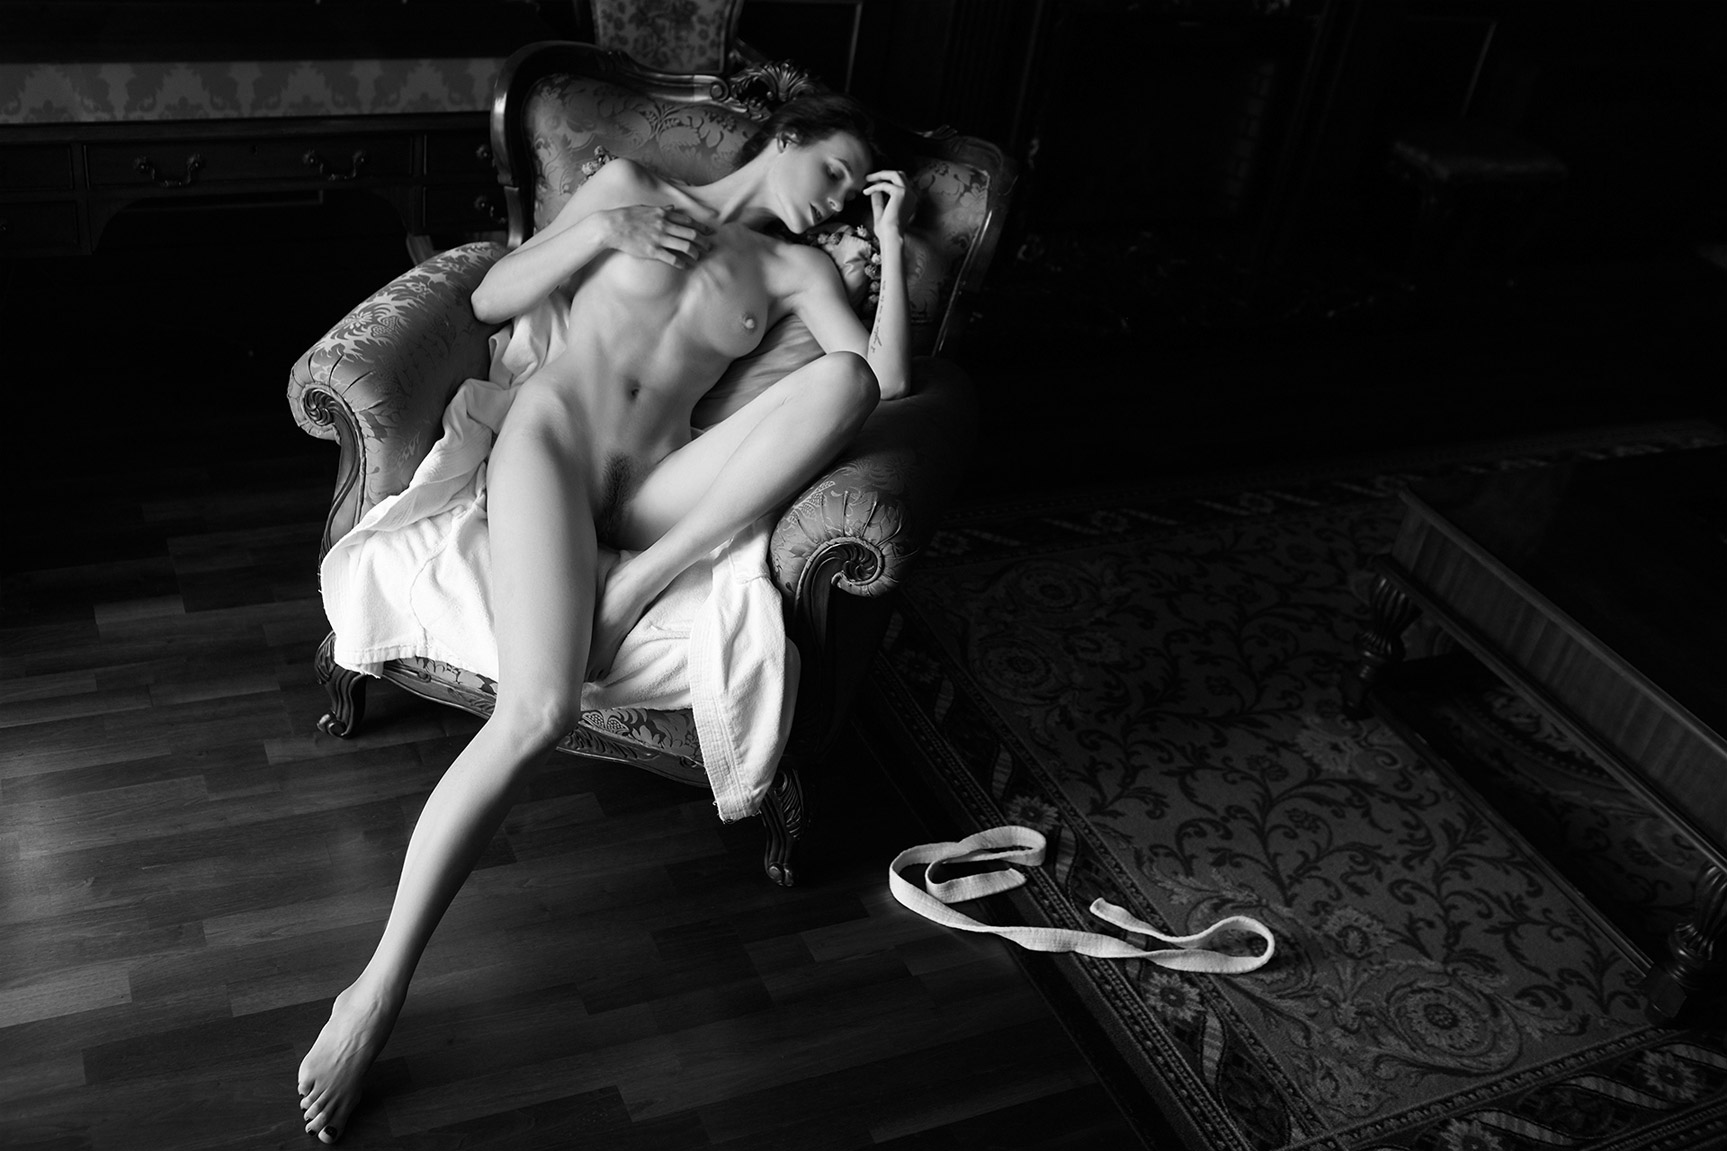 Настя Пех / Nastya Peh nude by Arthur Kaplun